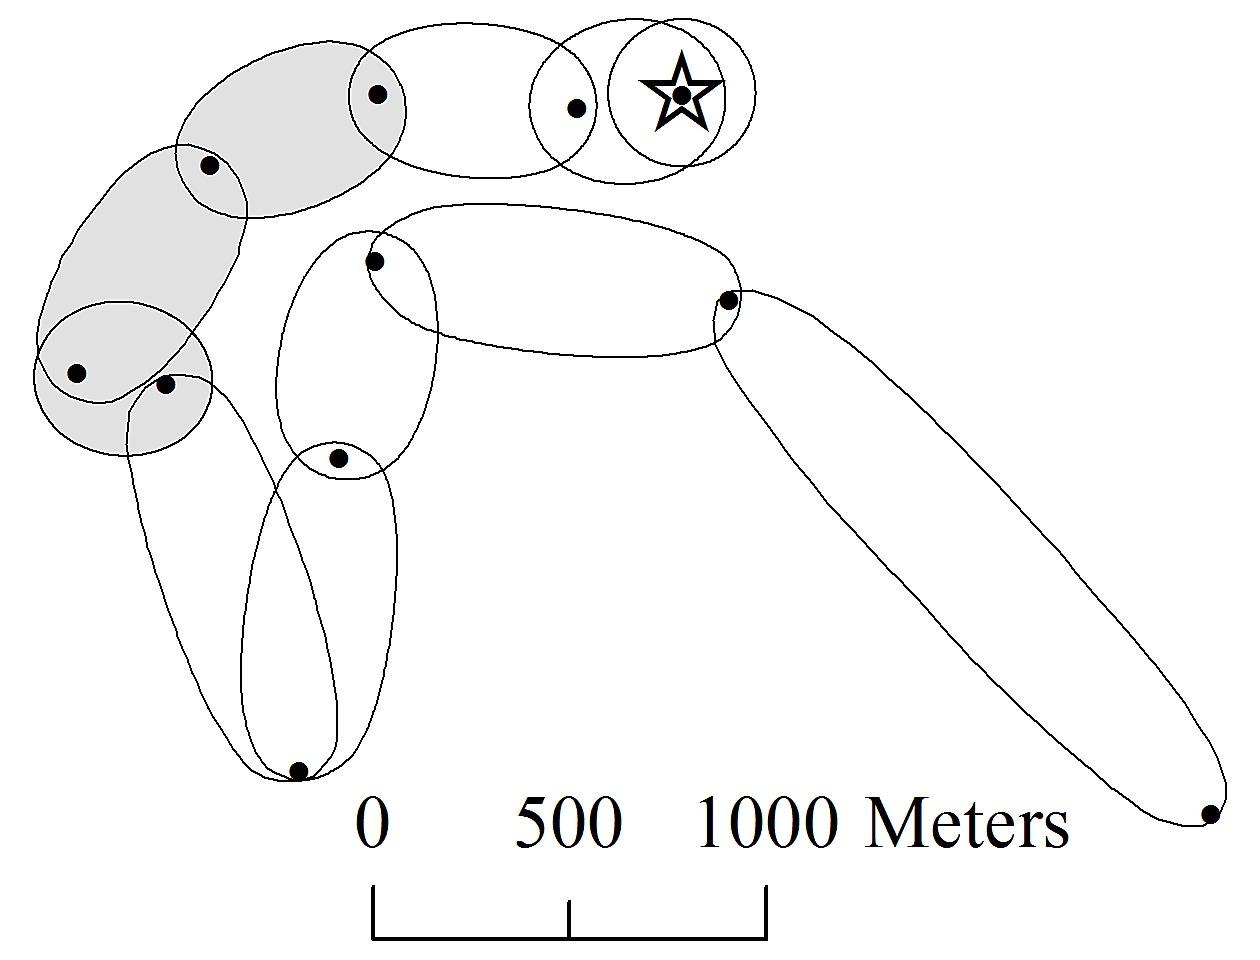 Linking GPS Telemetry Surveys and Scat Analyses Helps Explain ...